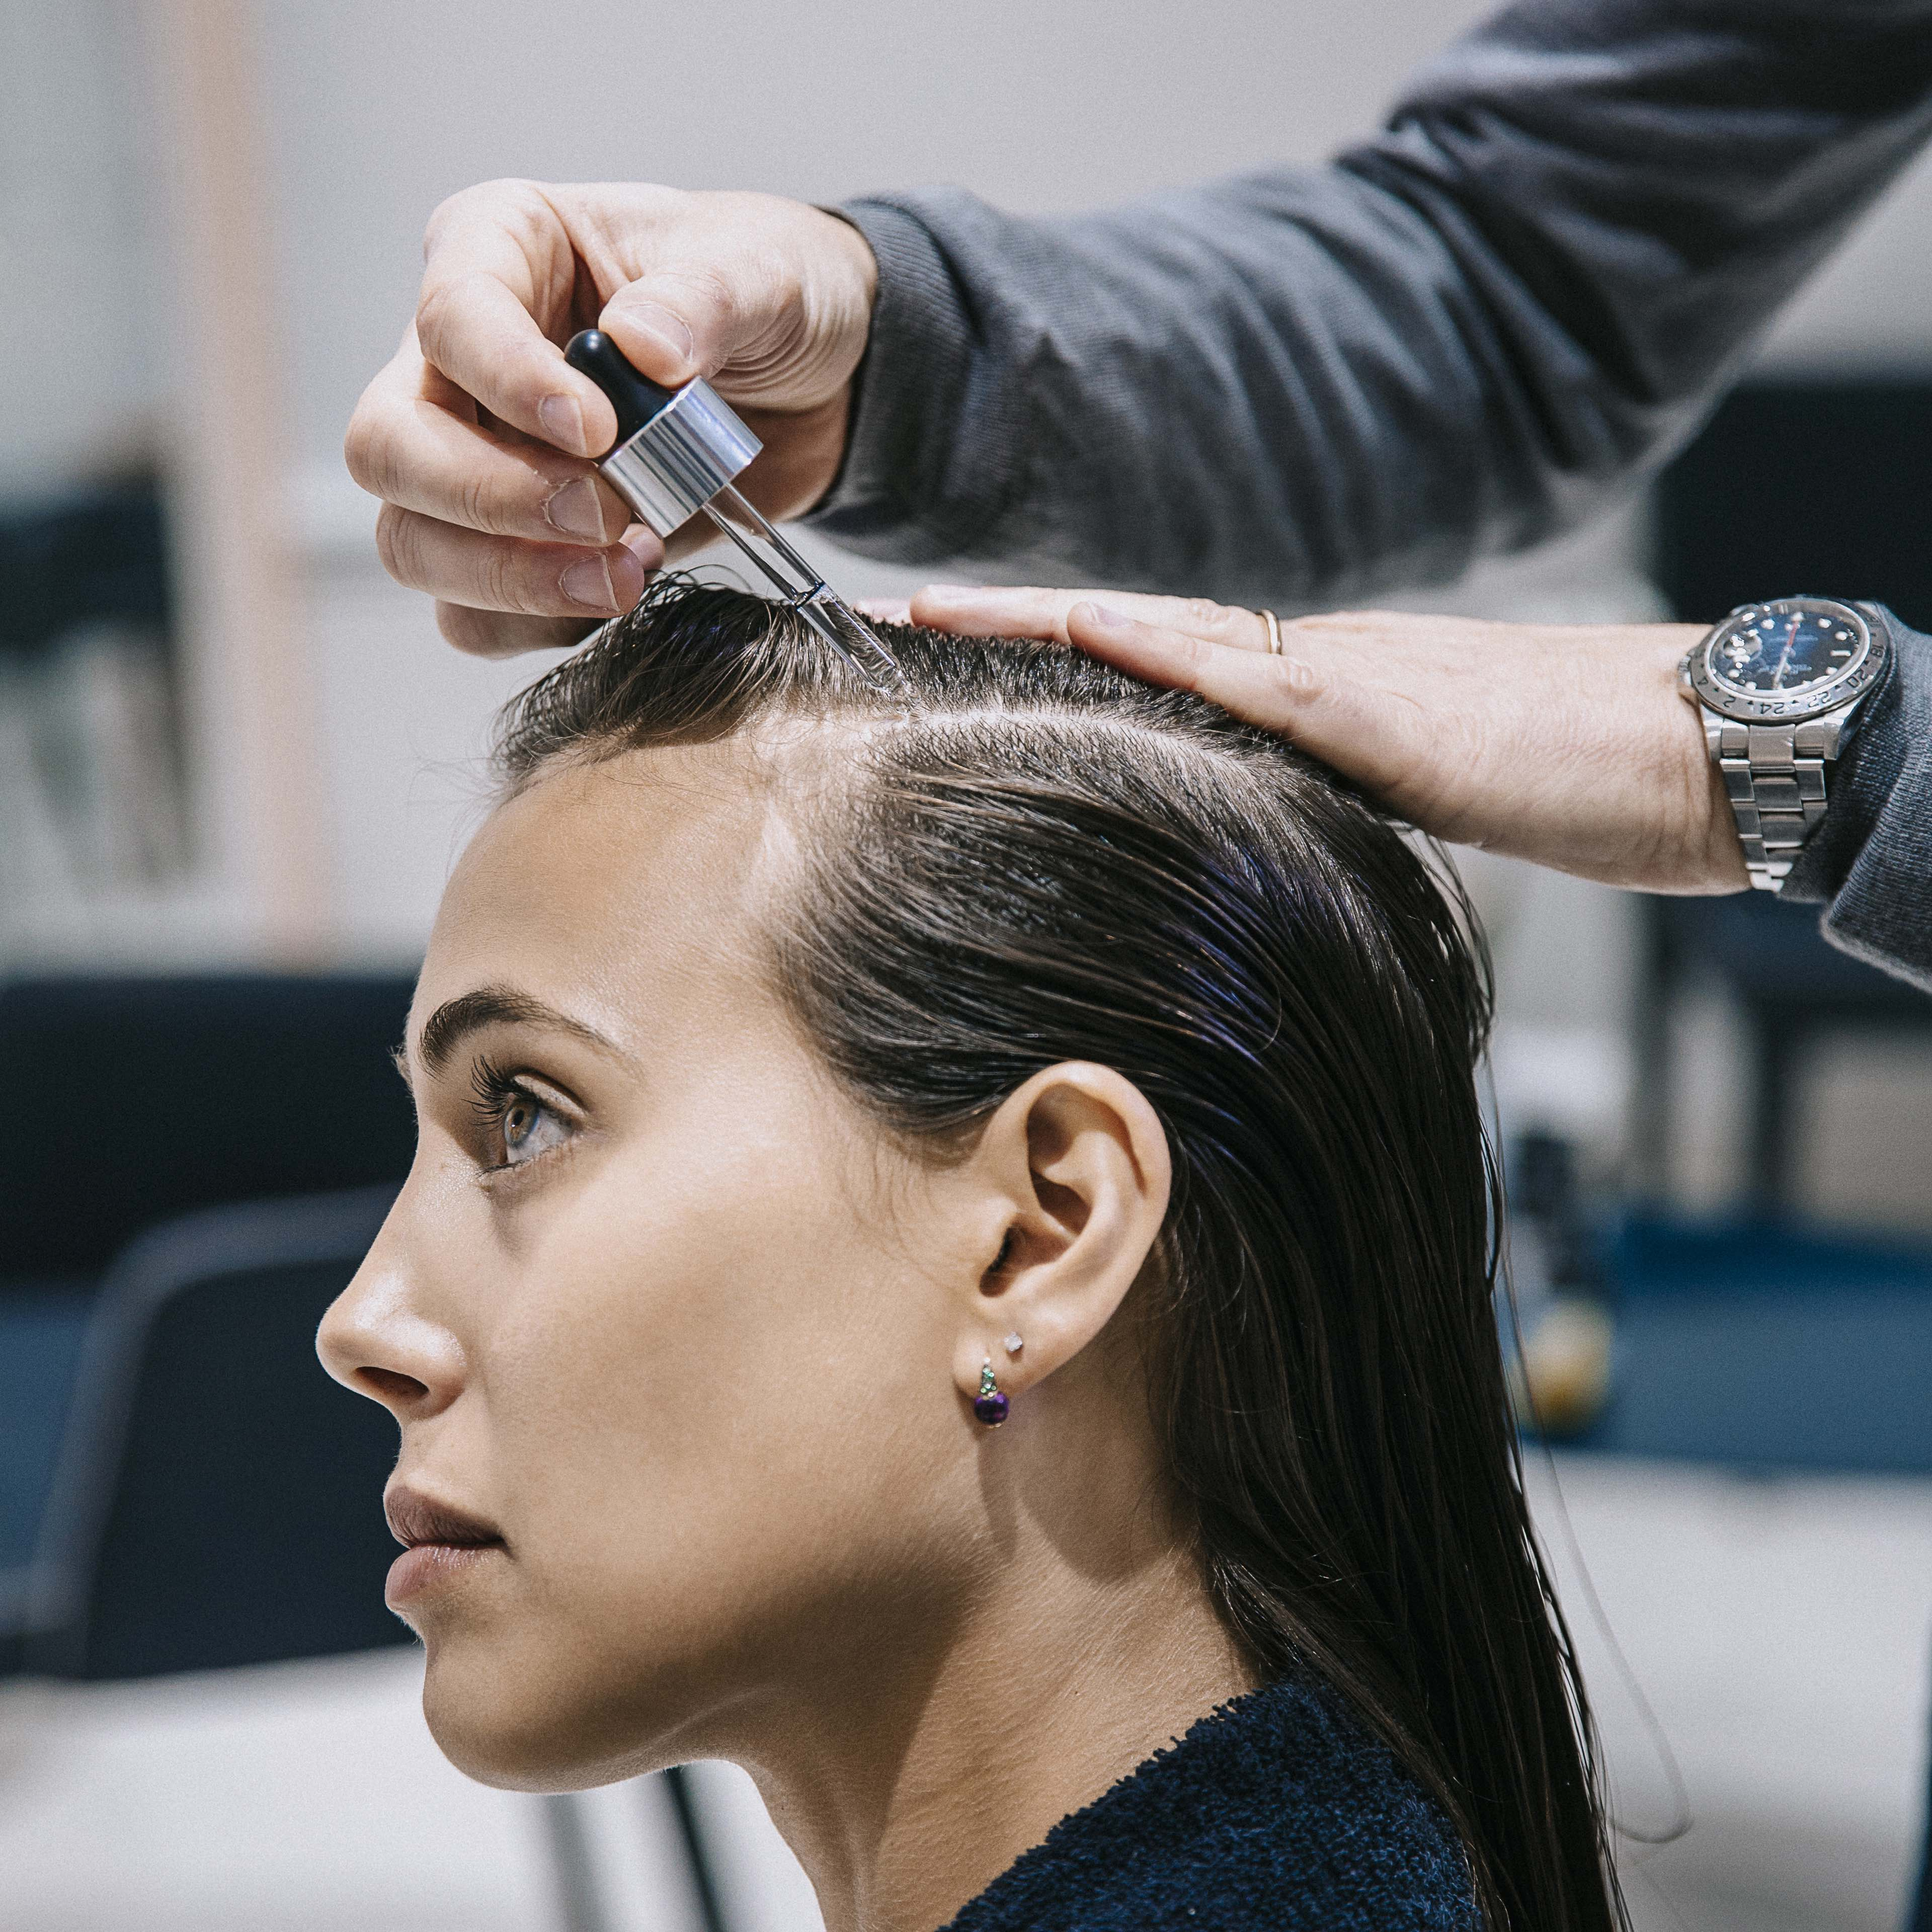 hair_rituel_lifestyle_model_5_square.jpeg